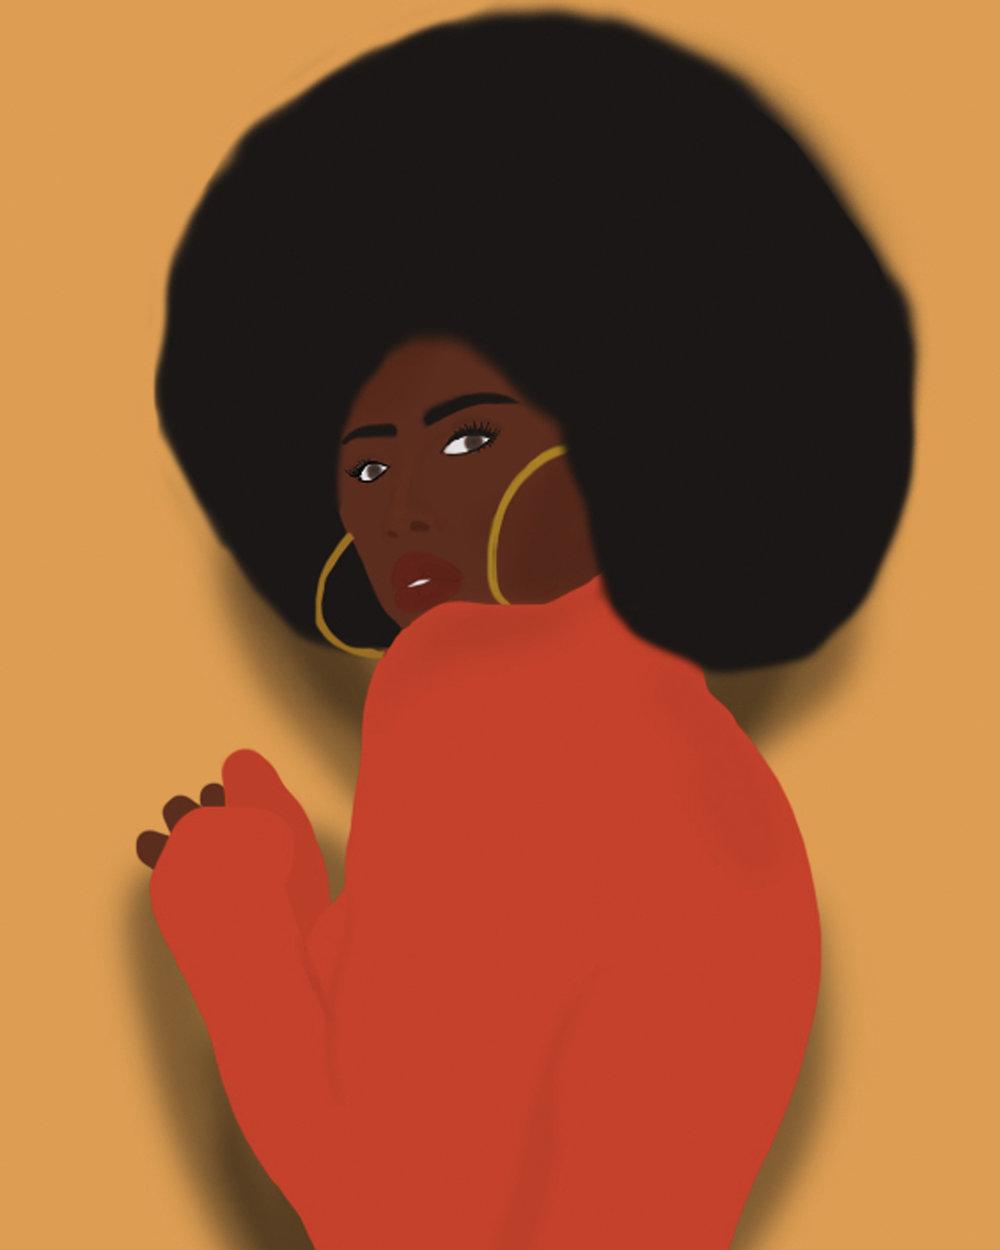 My Hair Story: A Personal Essay by: Prescylla Veronique